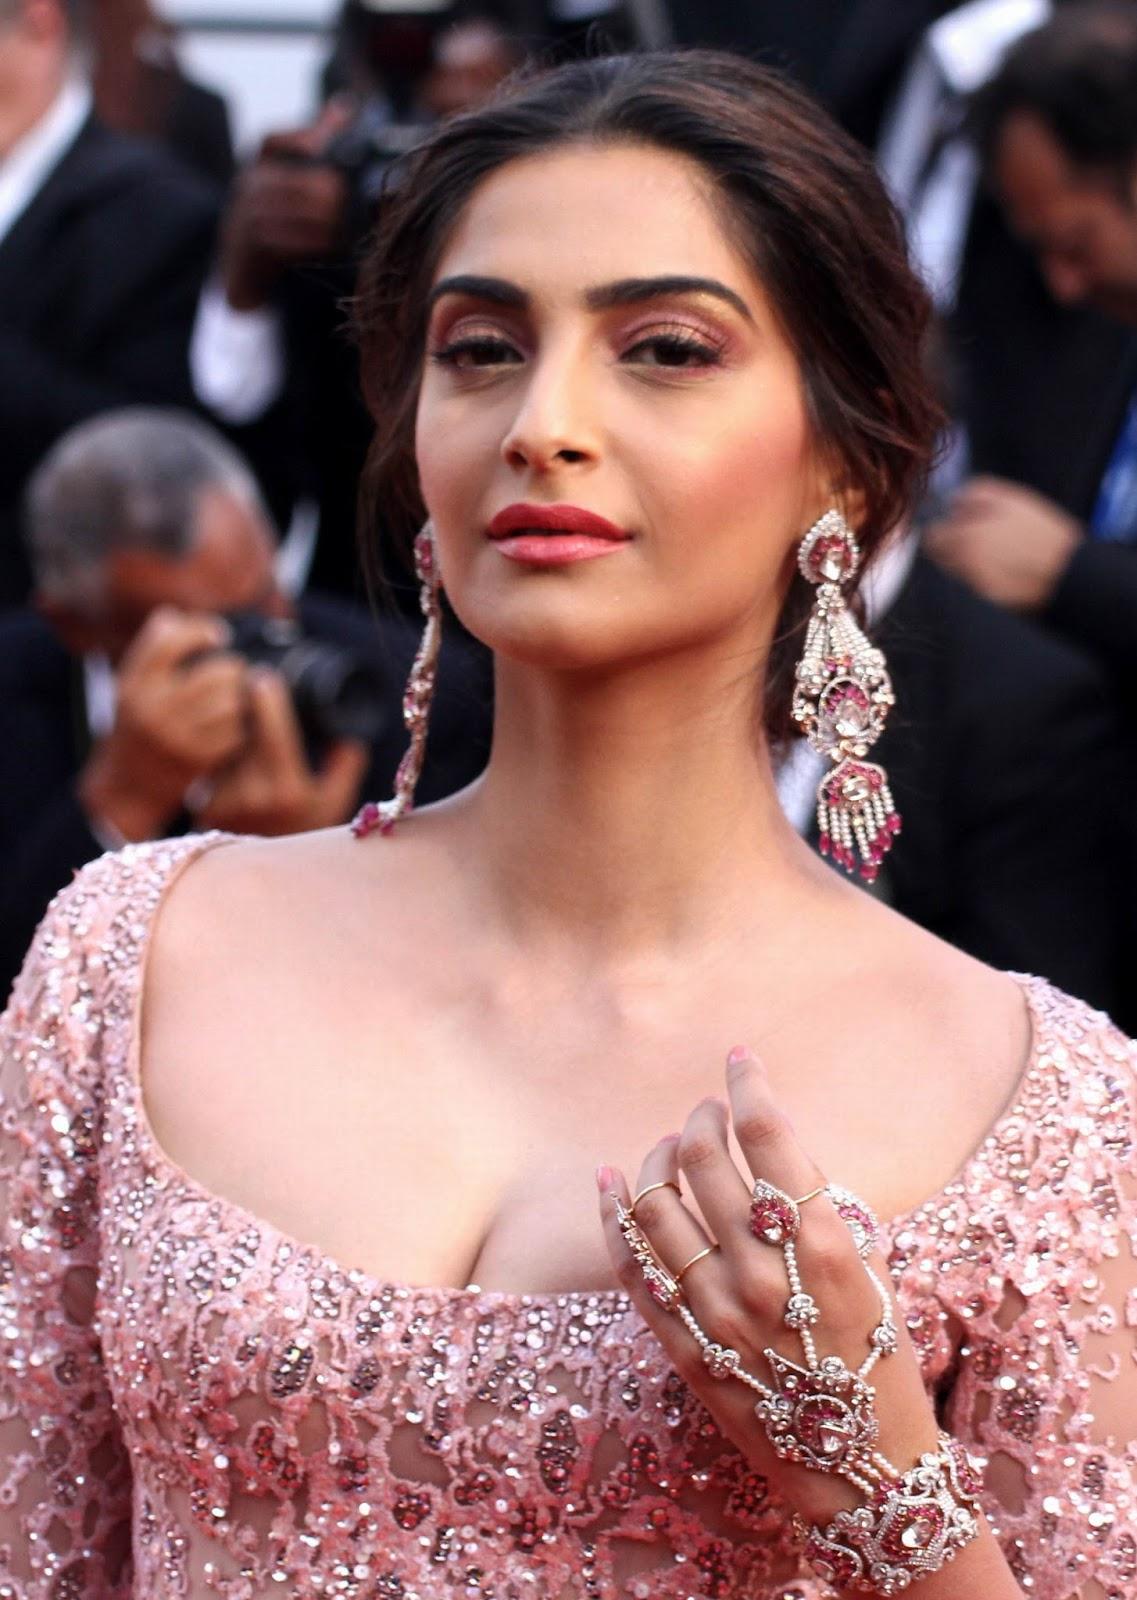 Sonam Kapoor Cannes Film Festival 2017 Photo Collection -4117